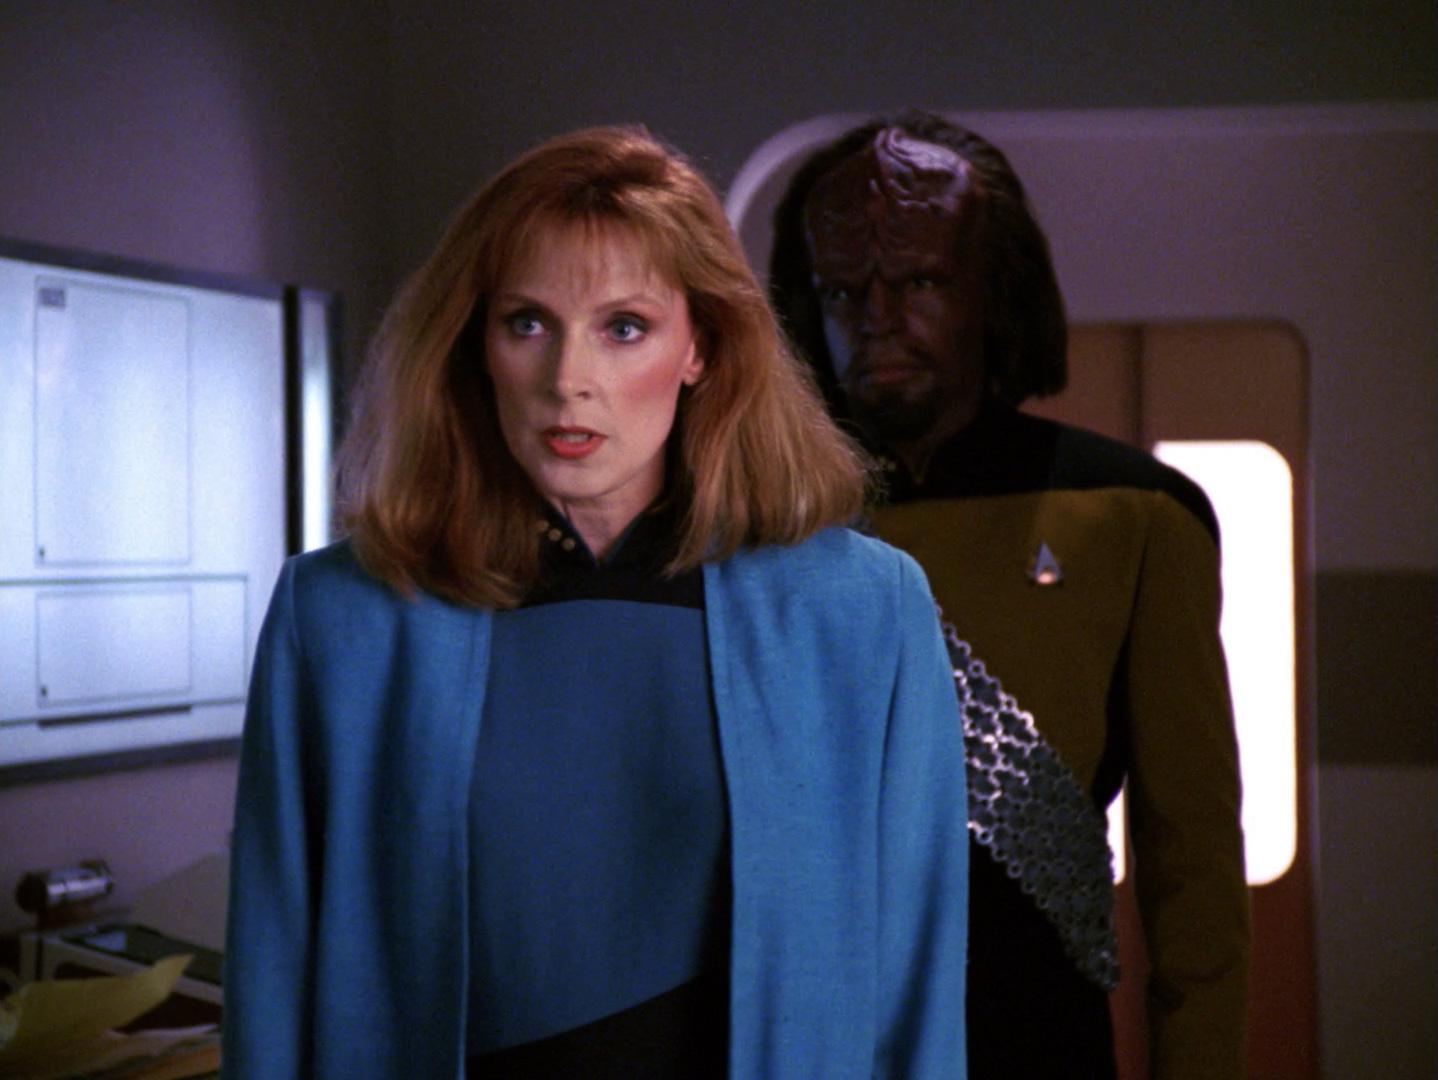 Star Trek: The Next Generation - Endars Sohn (Suddenly Human) Blu-ray Screencap © CBS/Paramount